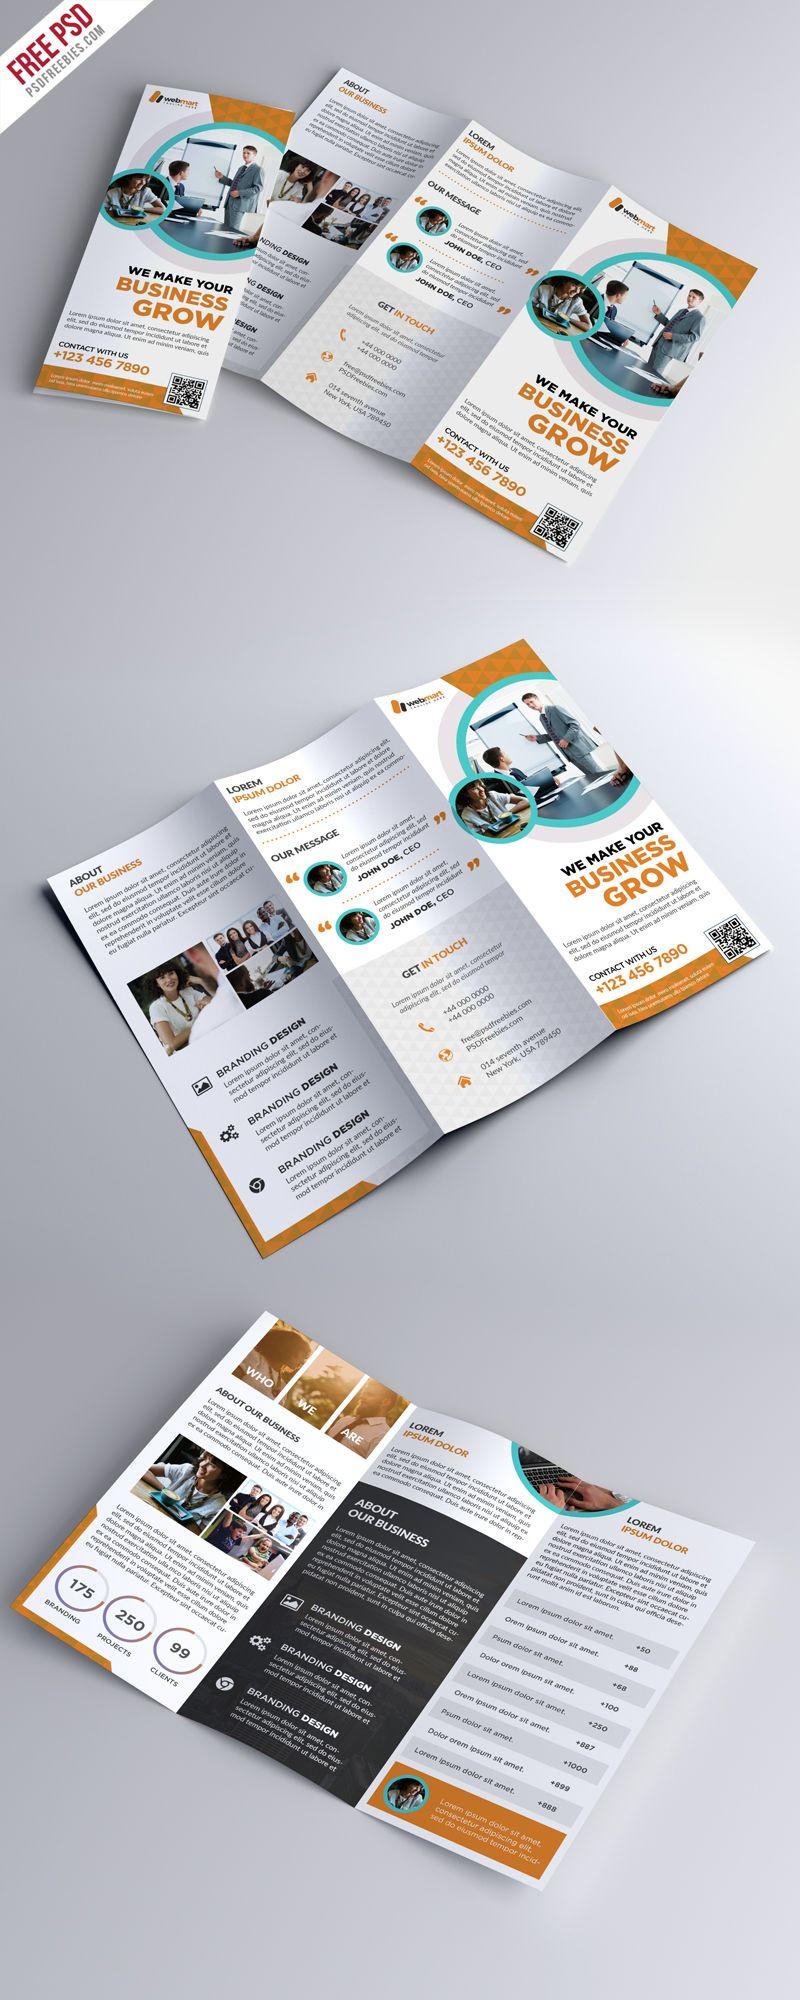 Trifold Brochure Template Free PSD | PSD Print Template | Pinterest ...